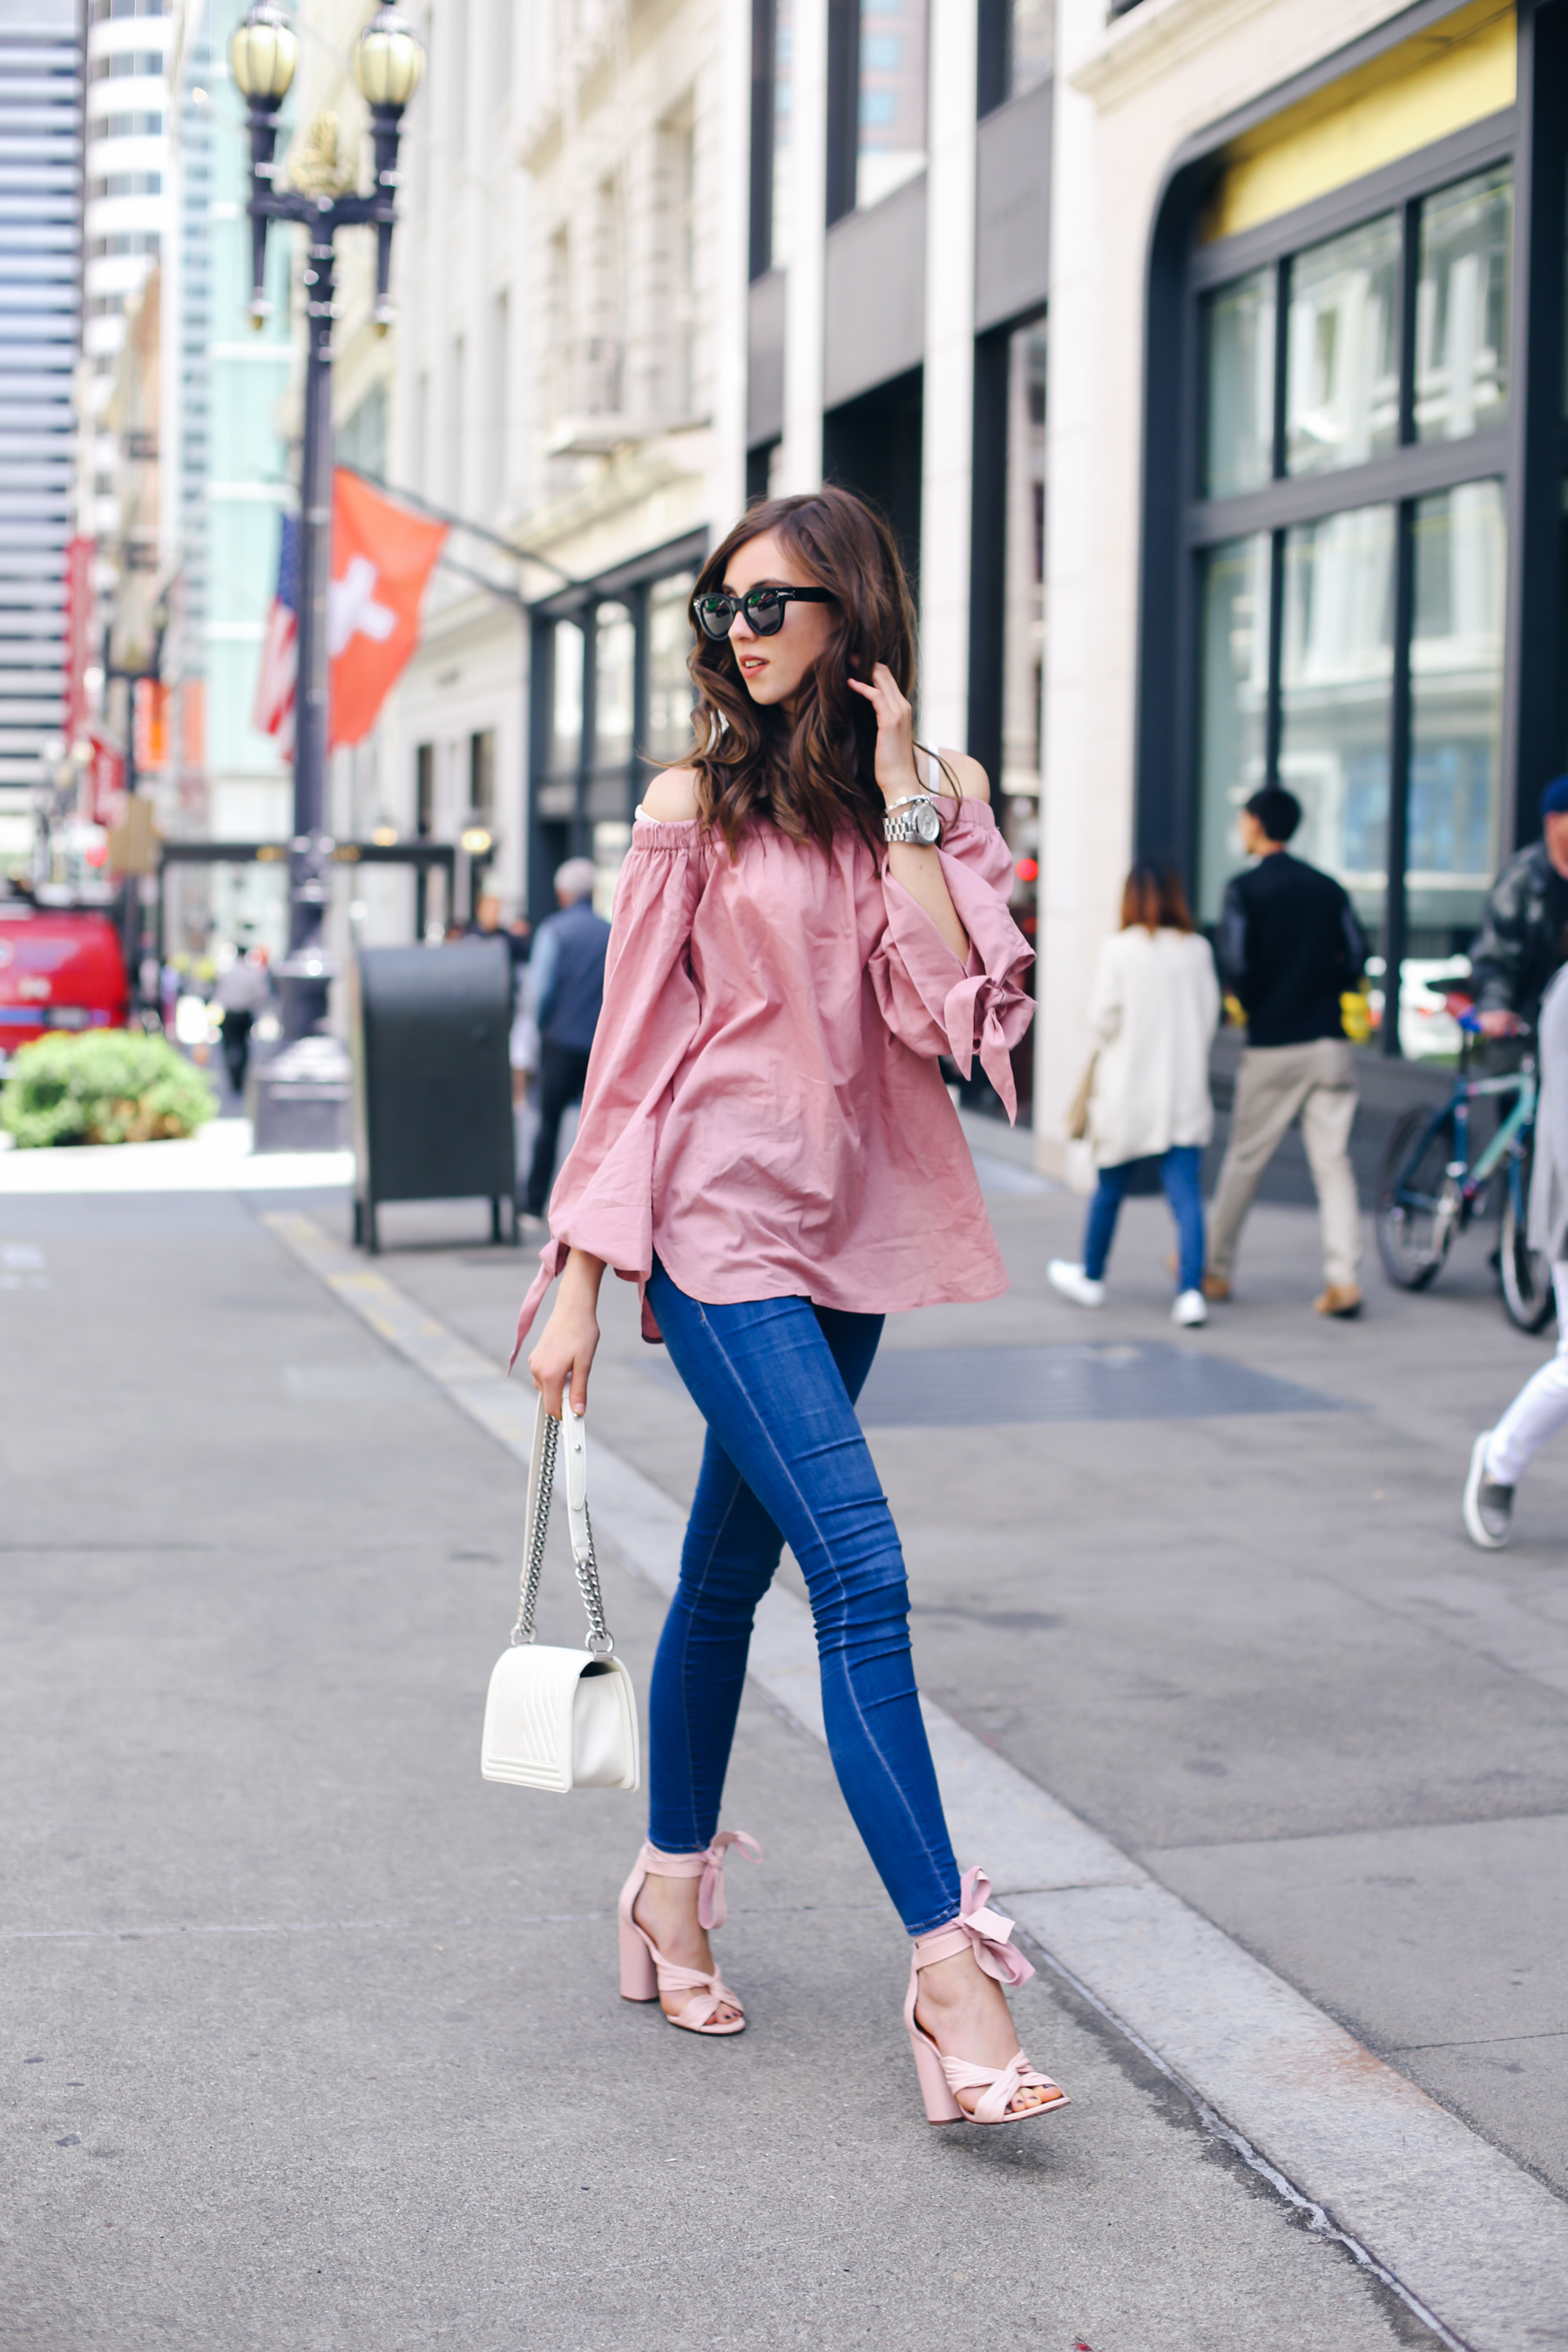 Barbora-Ondracova-FashioninmySoul-Fashion-Blogger-Photography-RyanbyRyanChua-7208